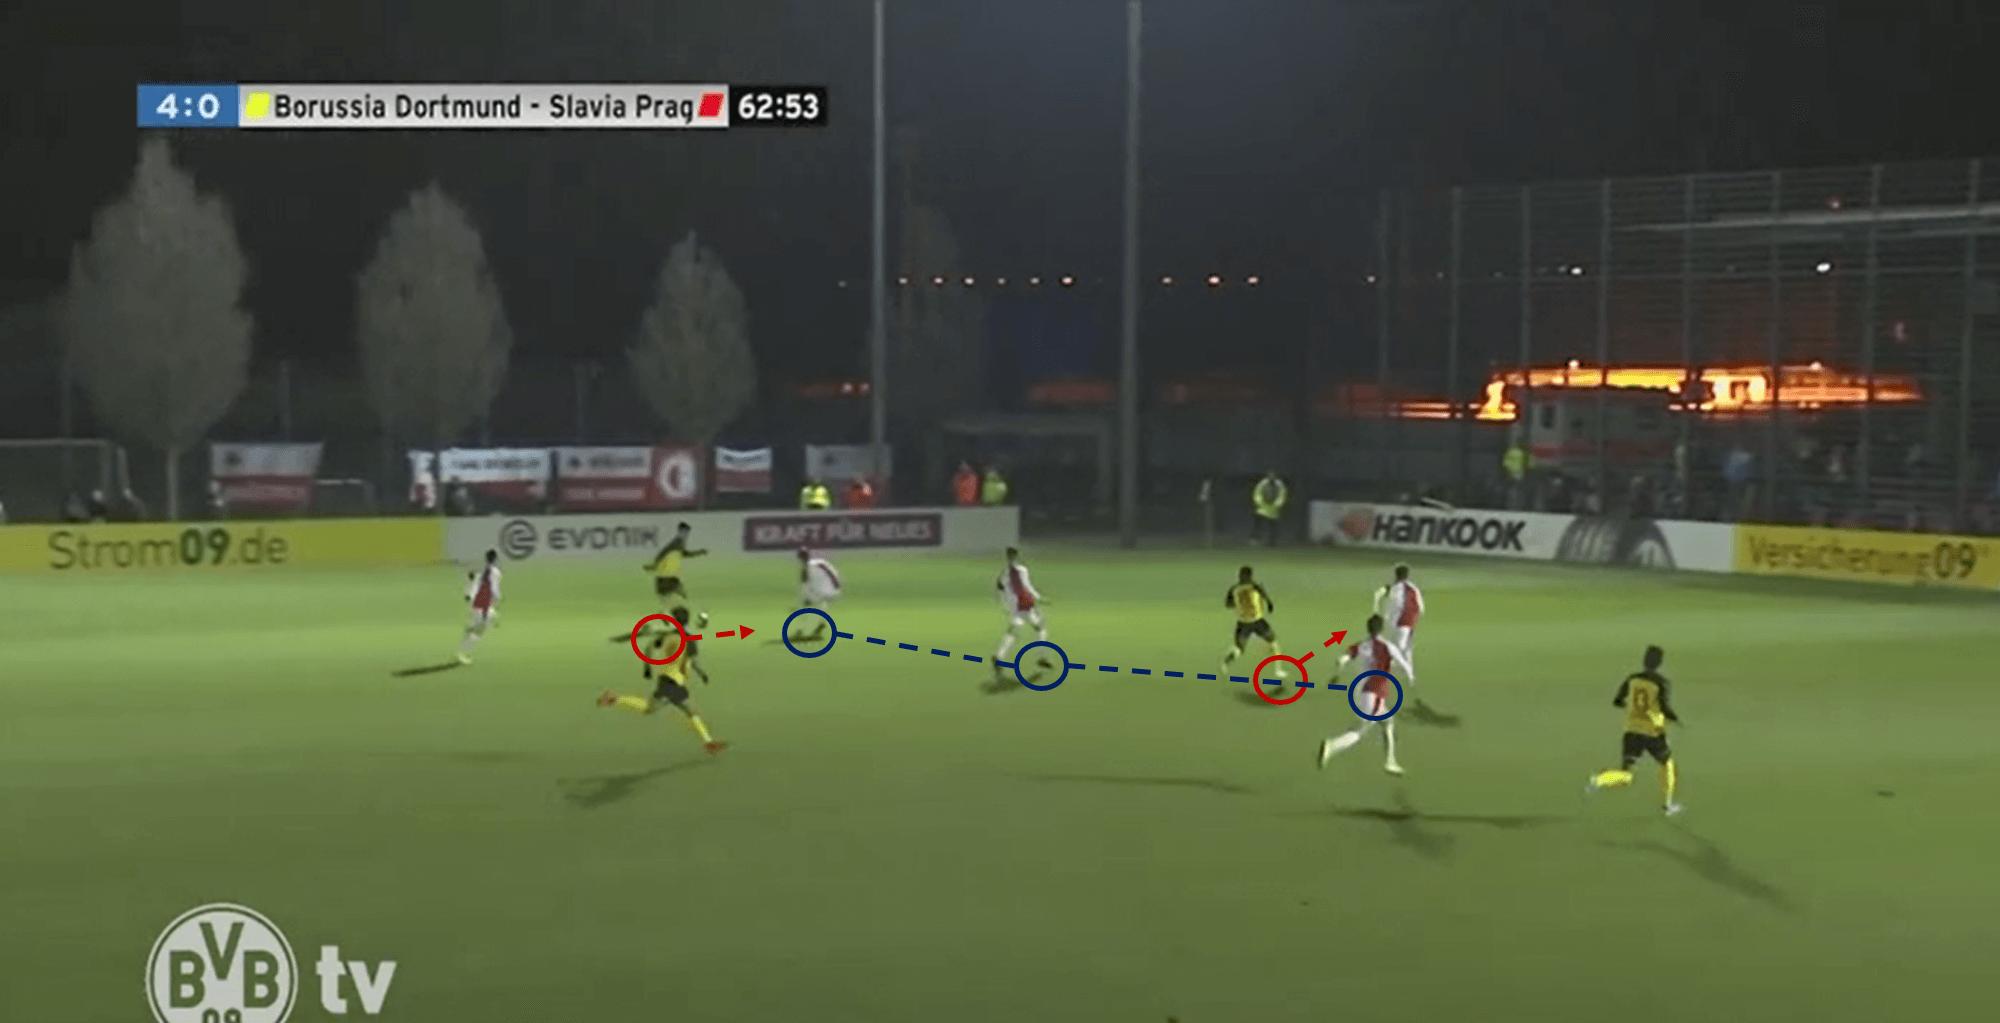 Data Analysis: Dortmund's quartet of U18 talent - statistics